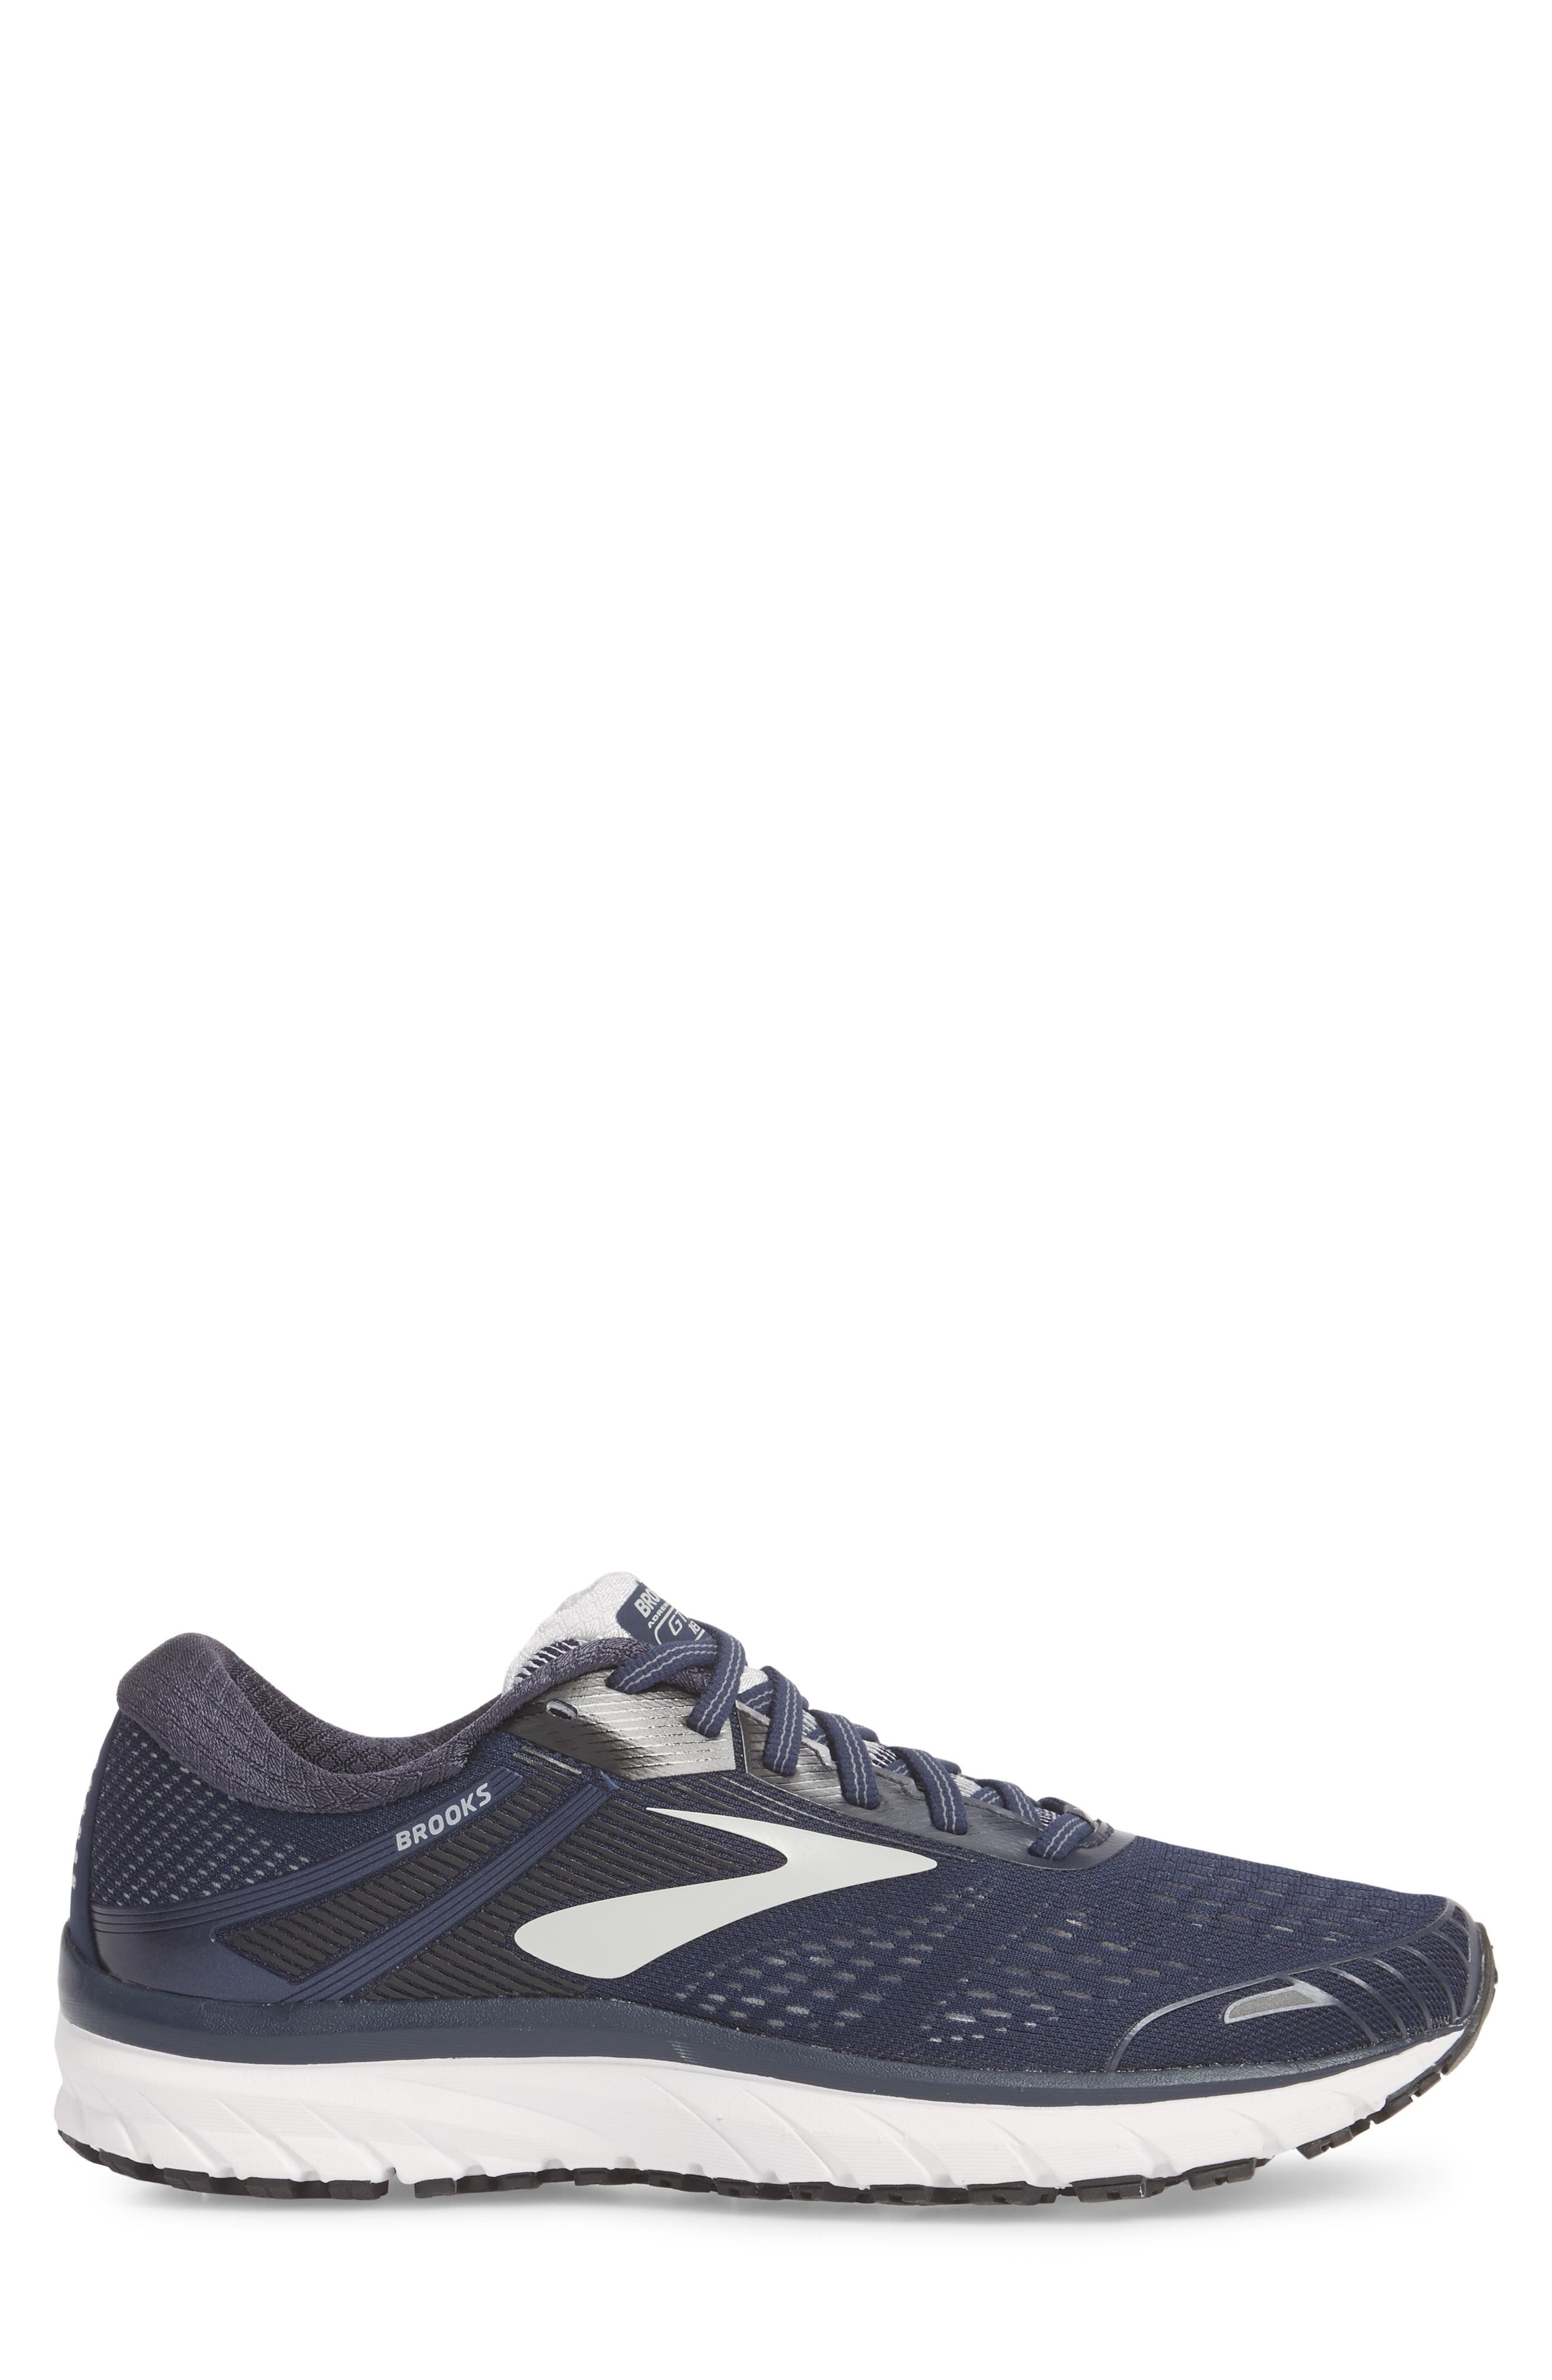 Adrenaline GTS 18 Running Shoe,                             Alternate thumbnail 3, color,                             Navy/ Grey/ Black